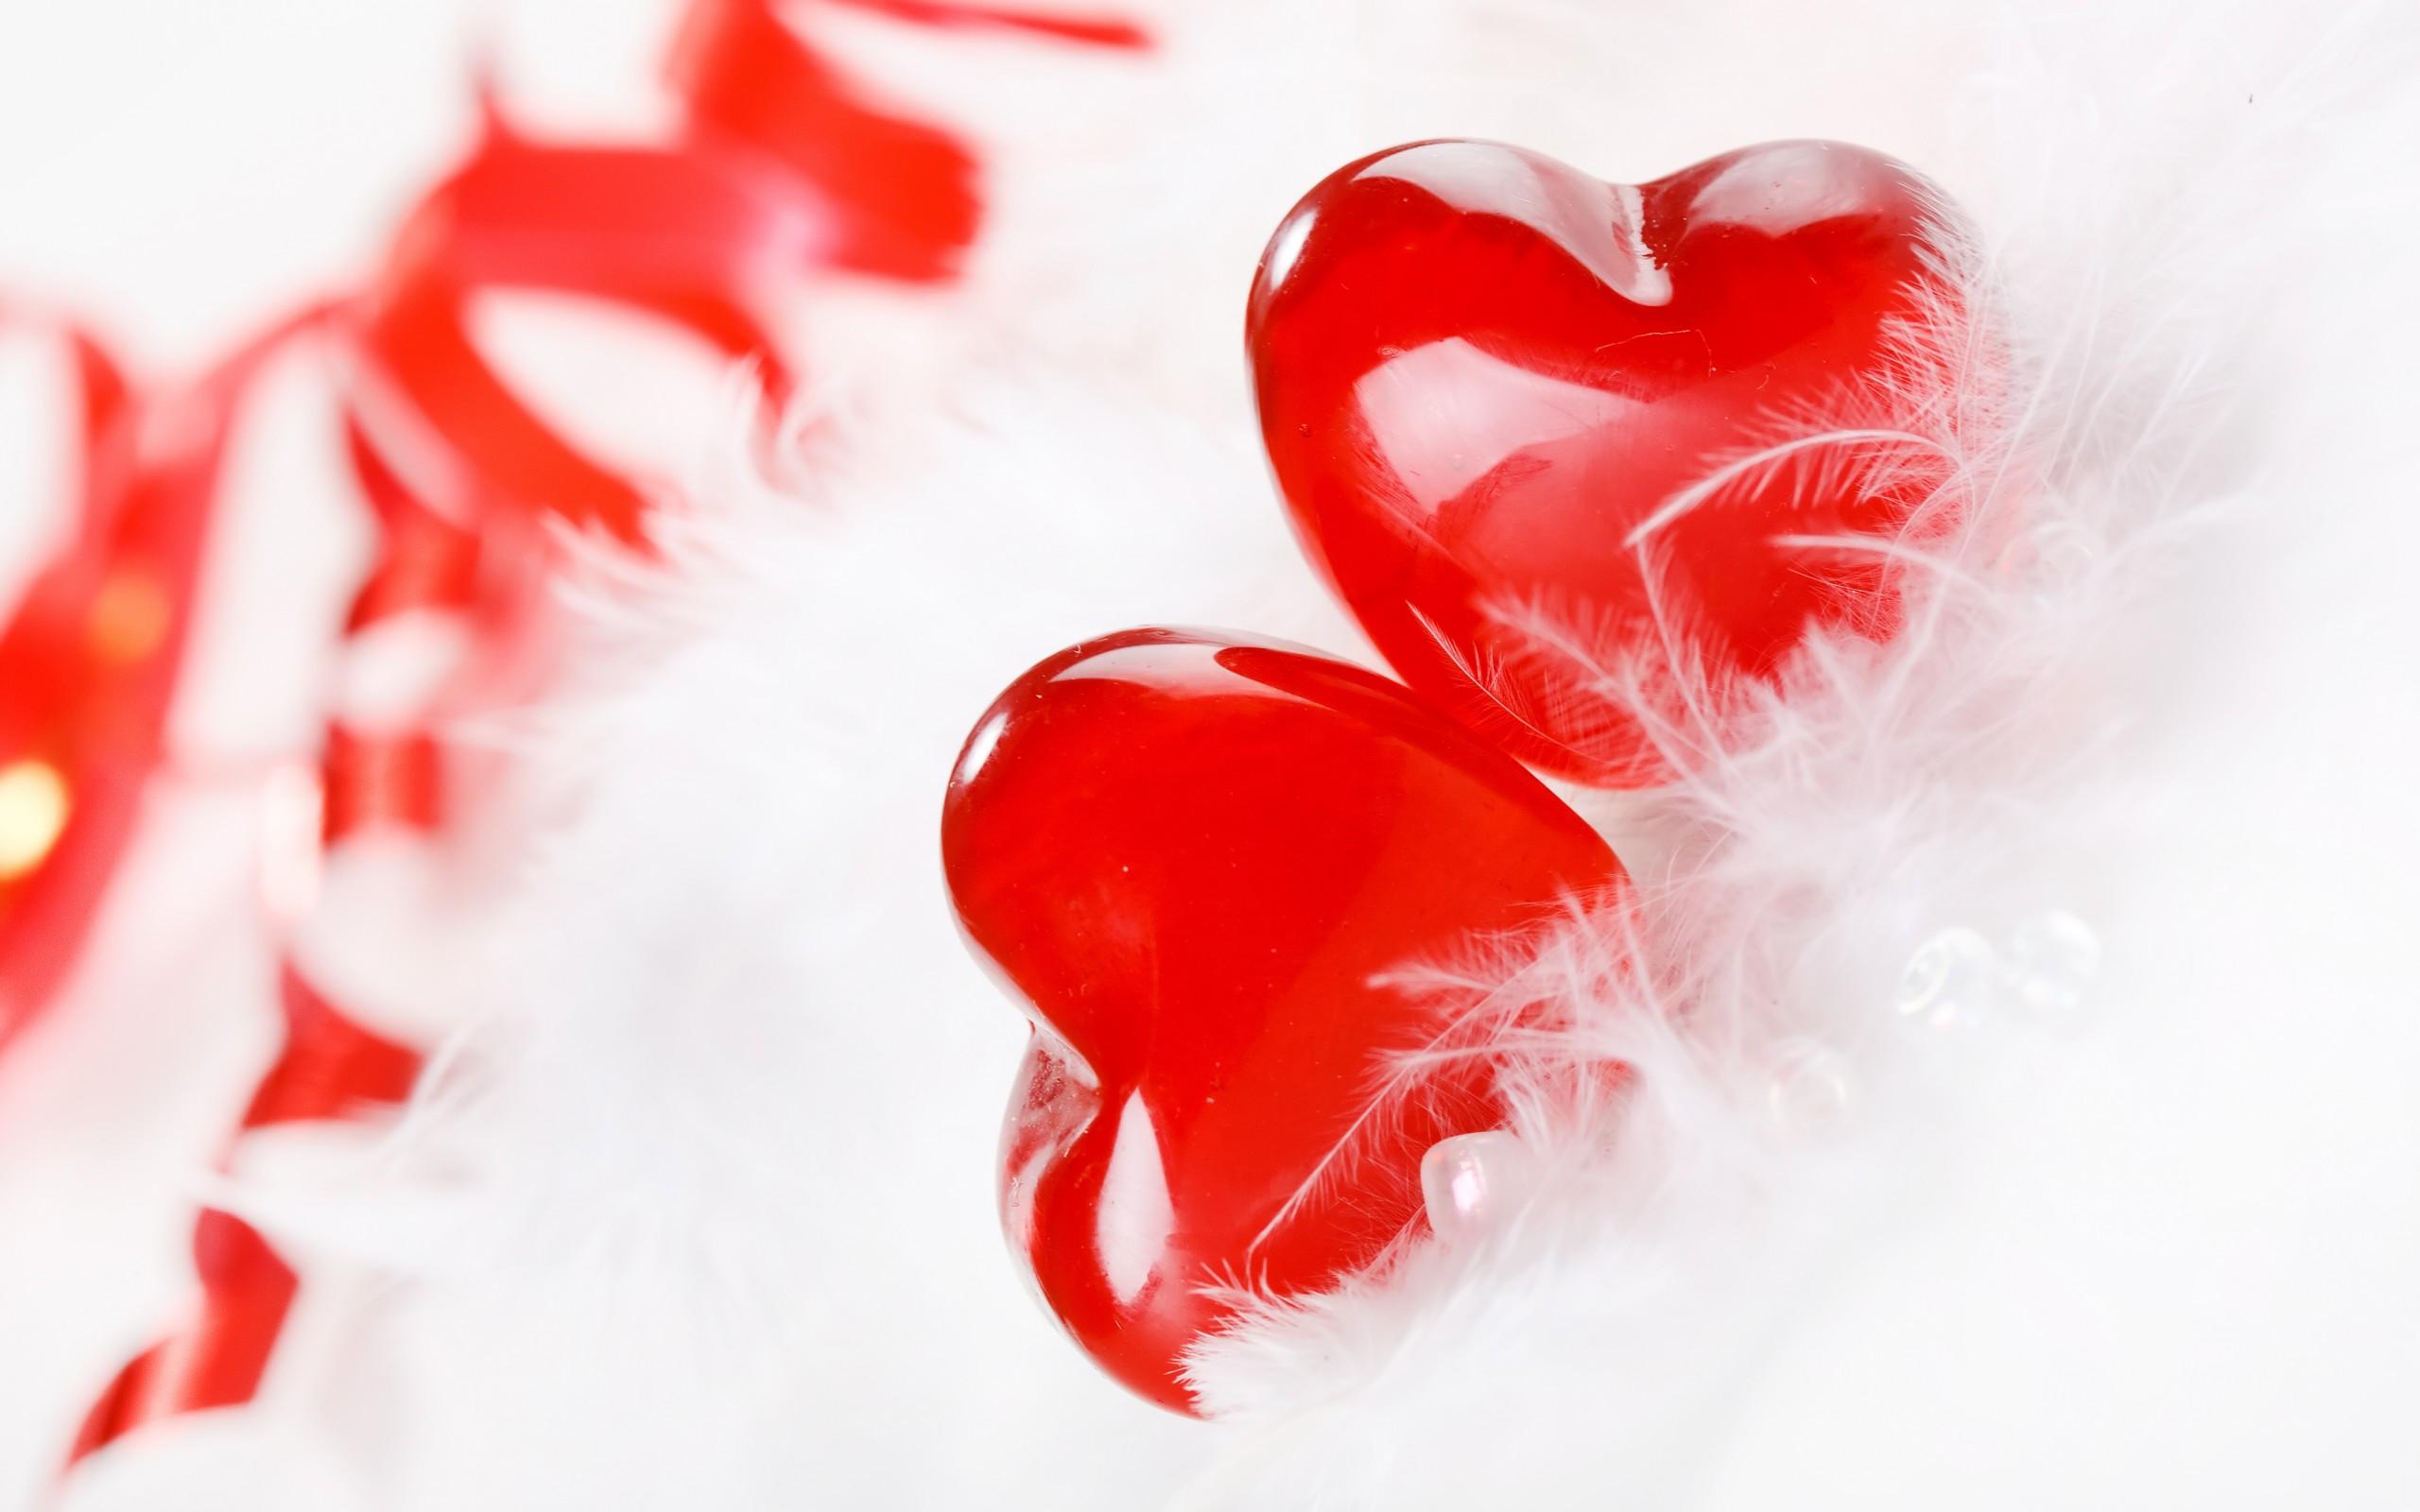 Картинки на аву для девушек сердца